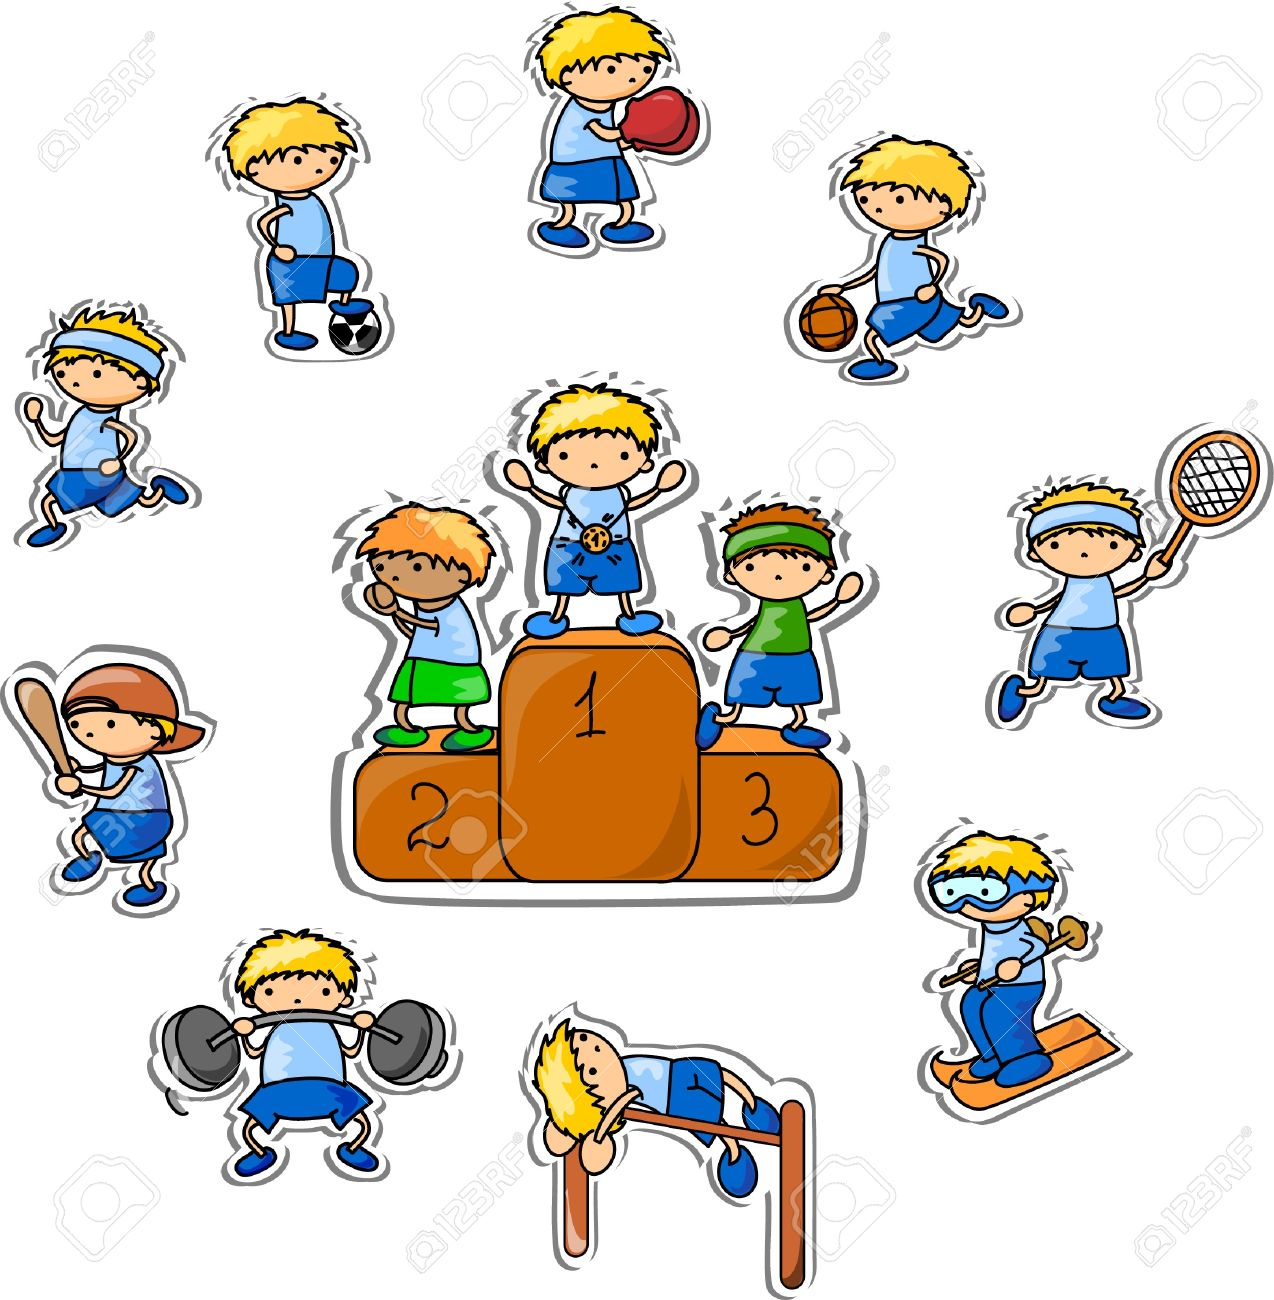 cartoon sport icon Stock Vector - 13484193